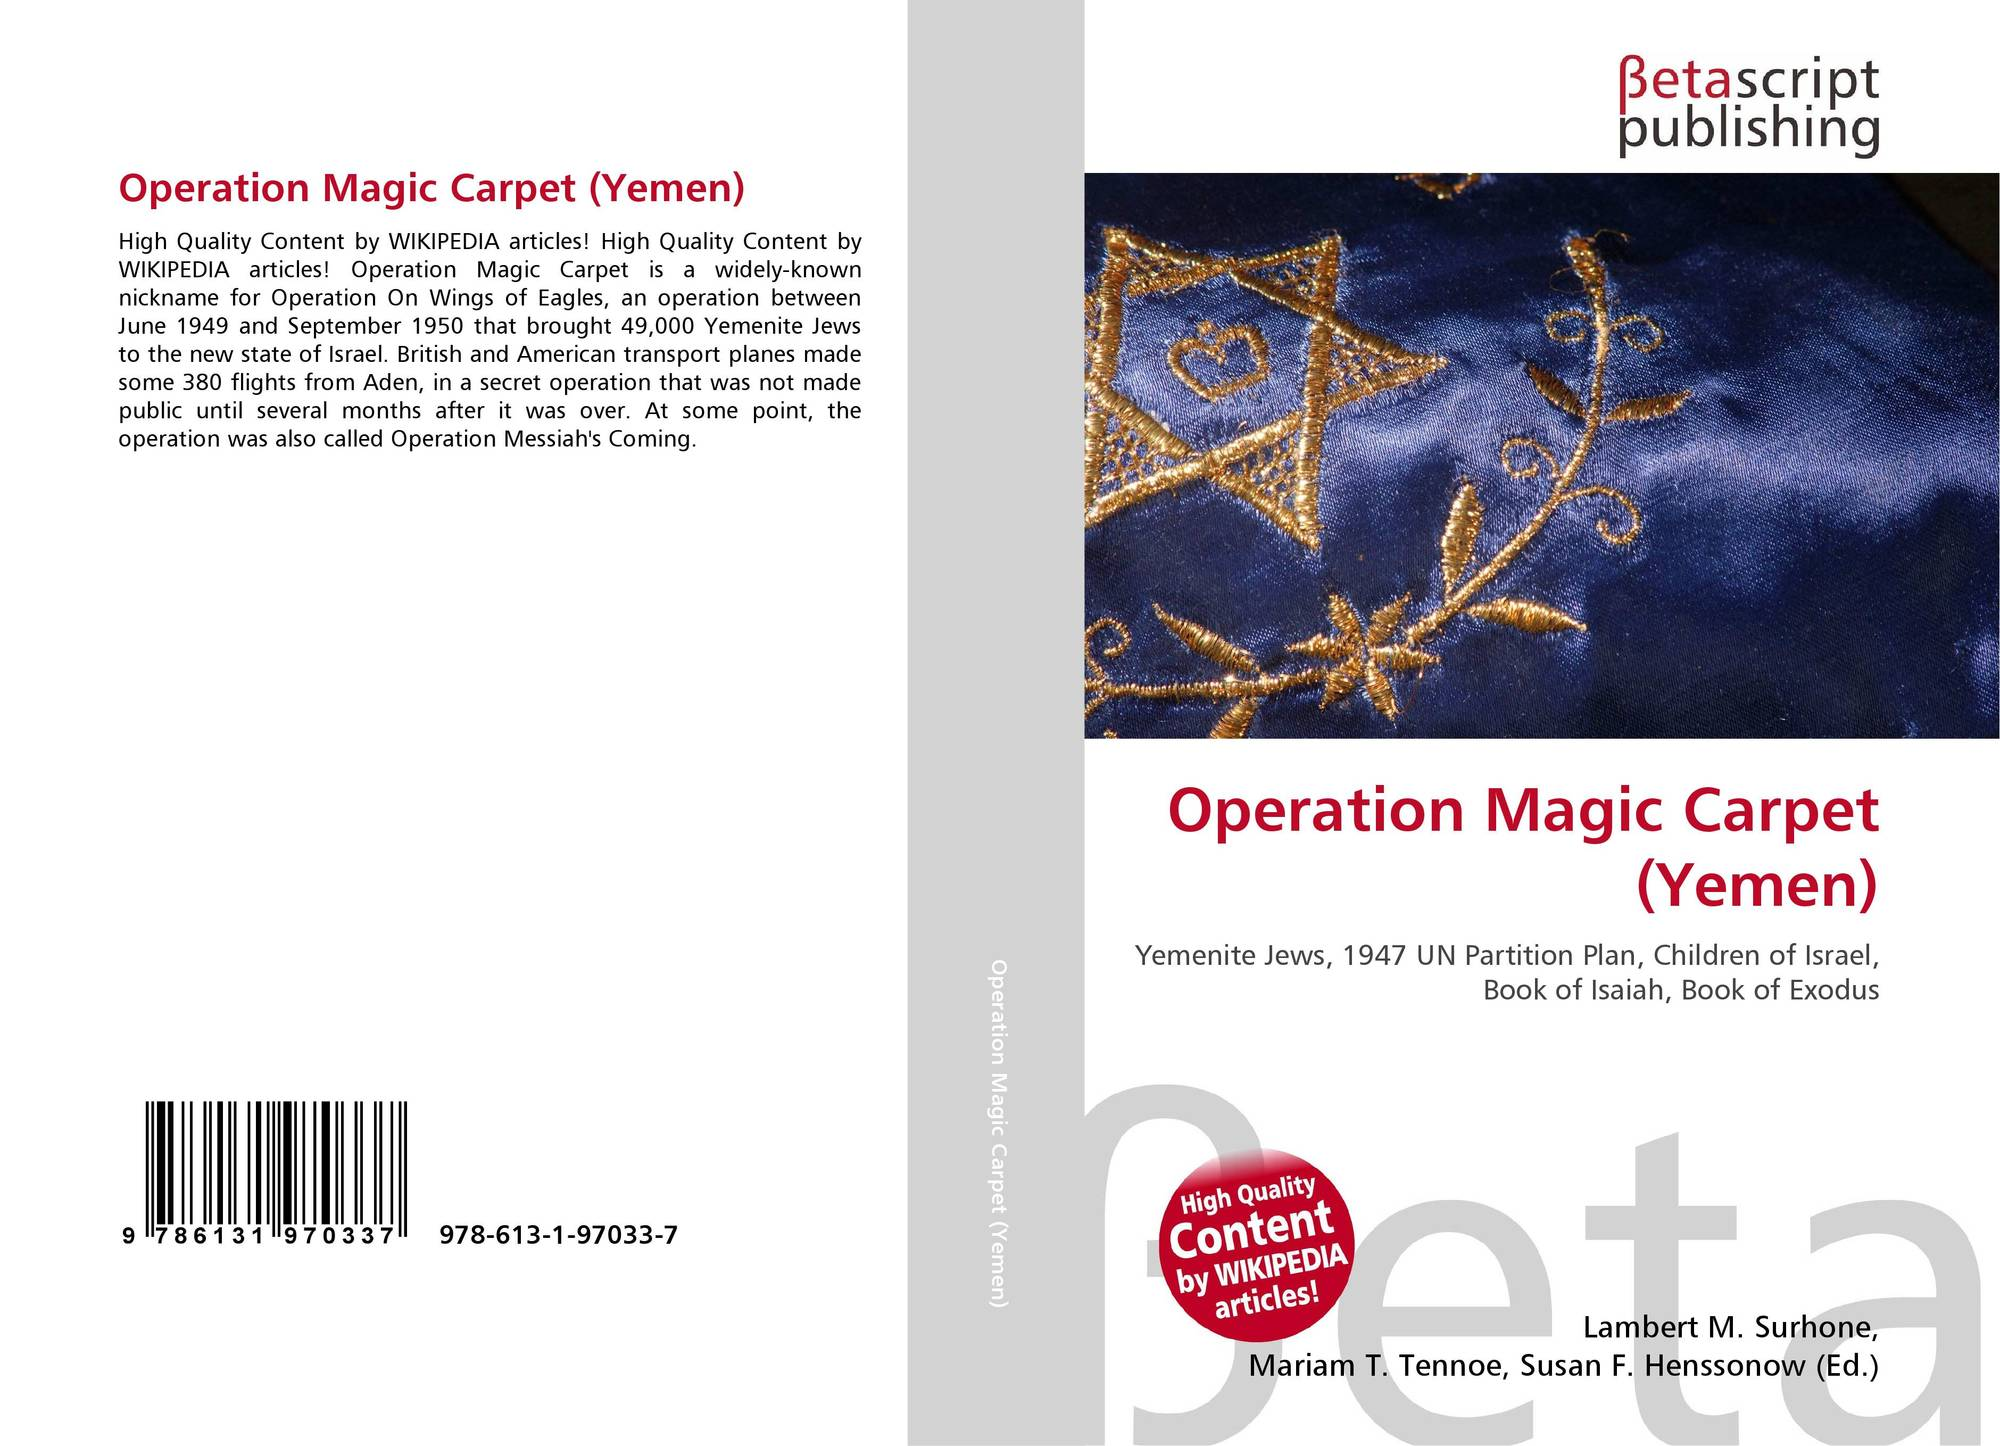 Operation Magic Carpet (Yemen), 978-613-1-97033-7